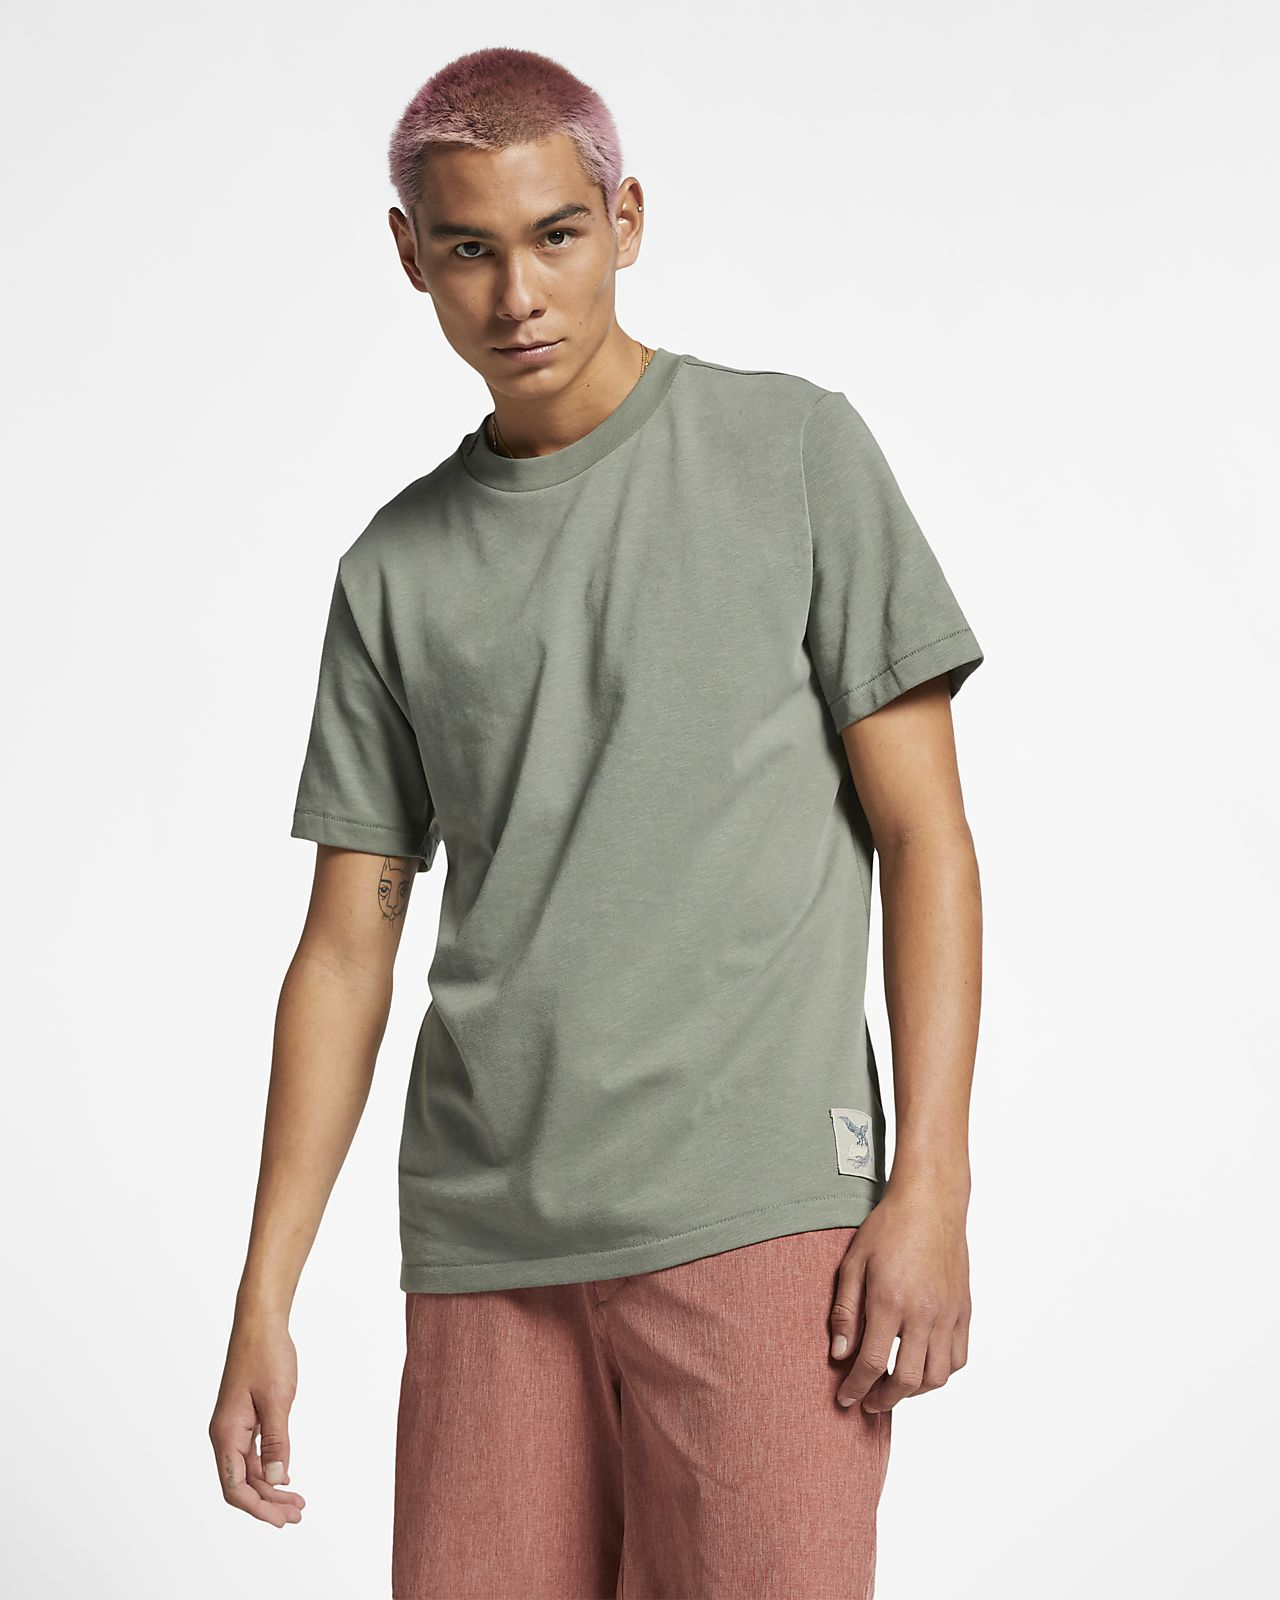 Hurley Dri-FIT Savage Men's Short-Sleeve Shirt